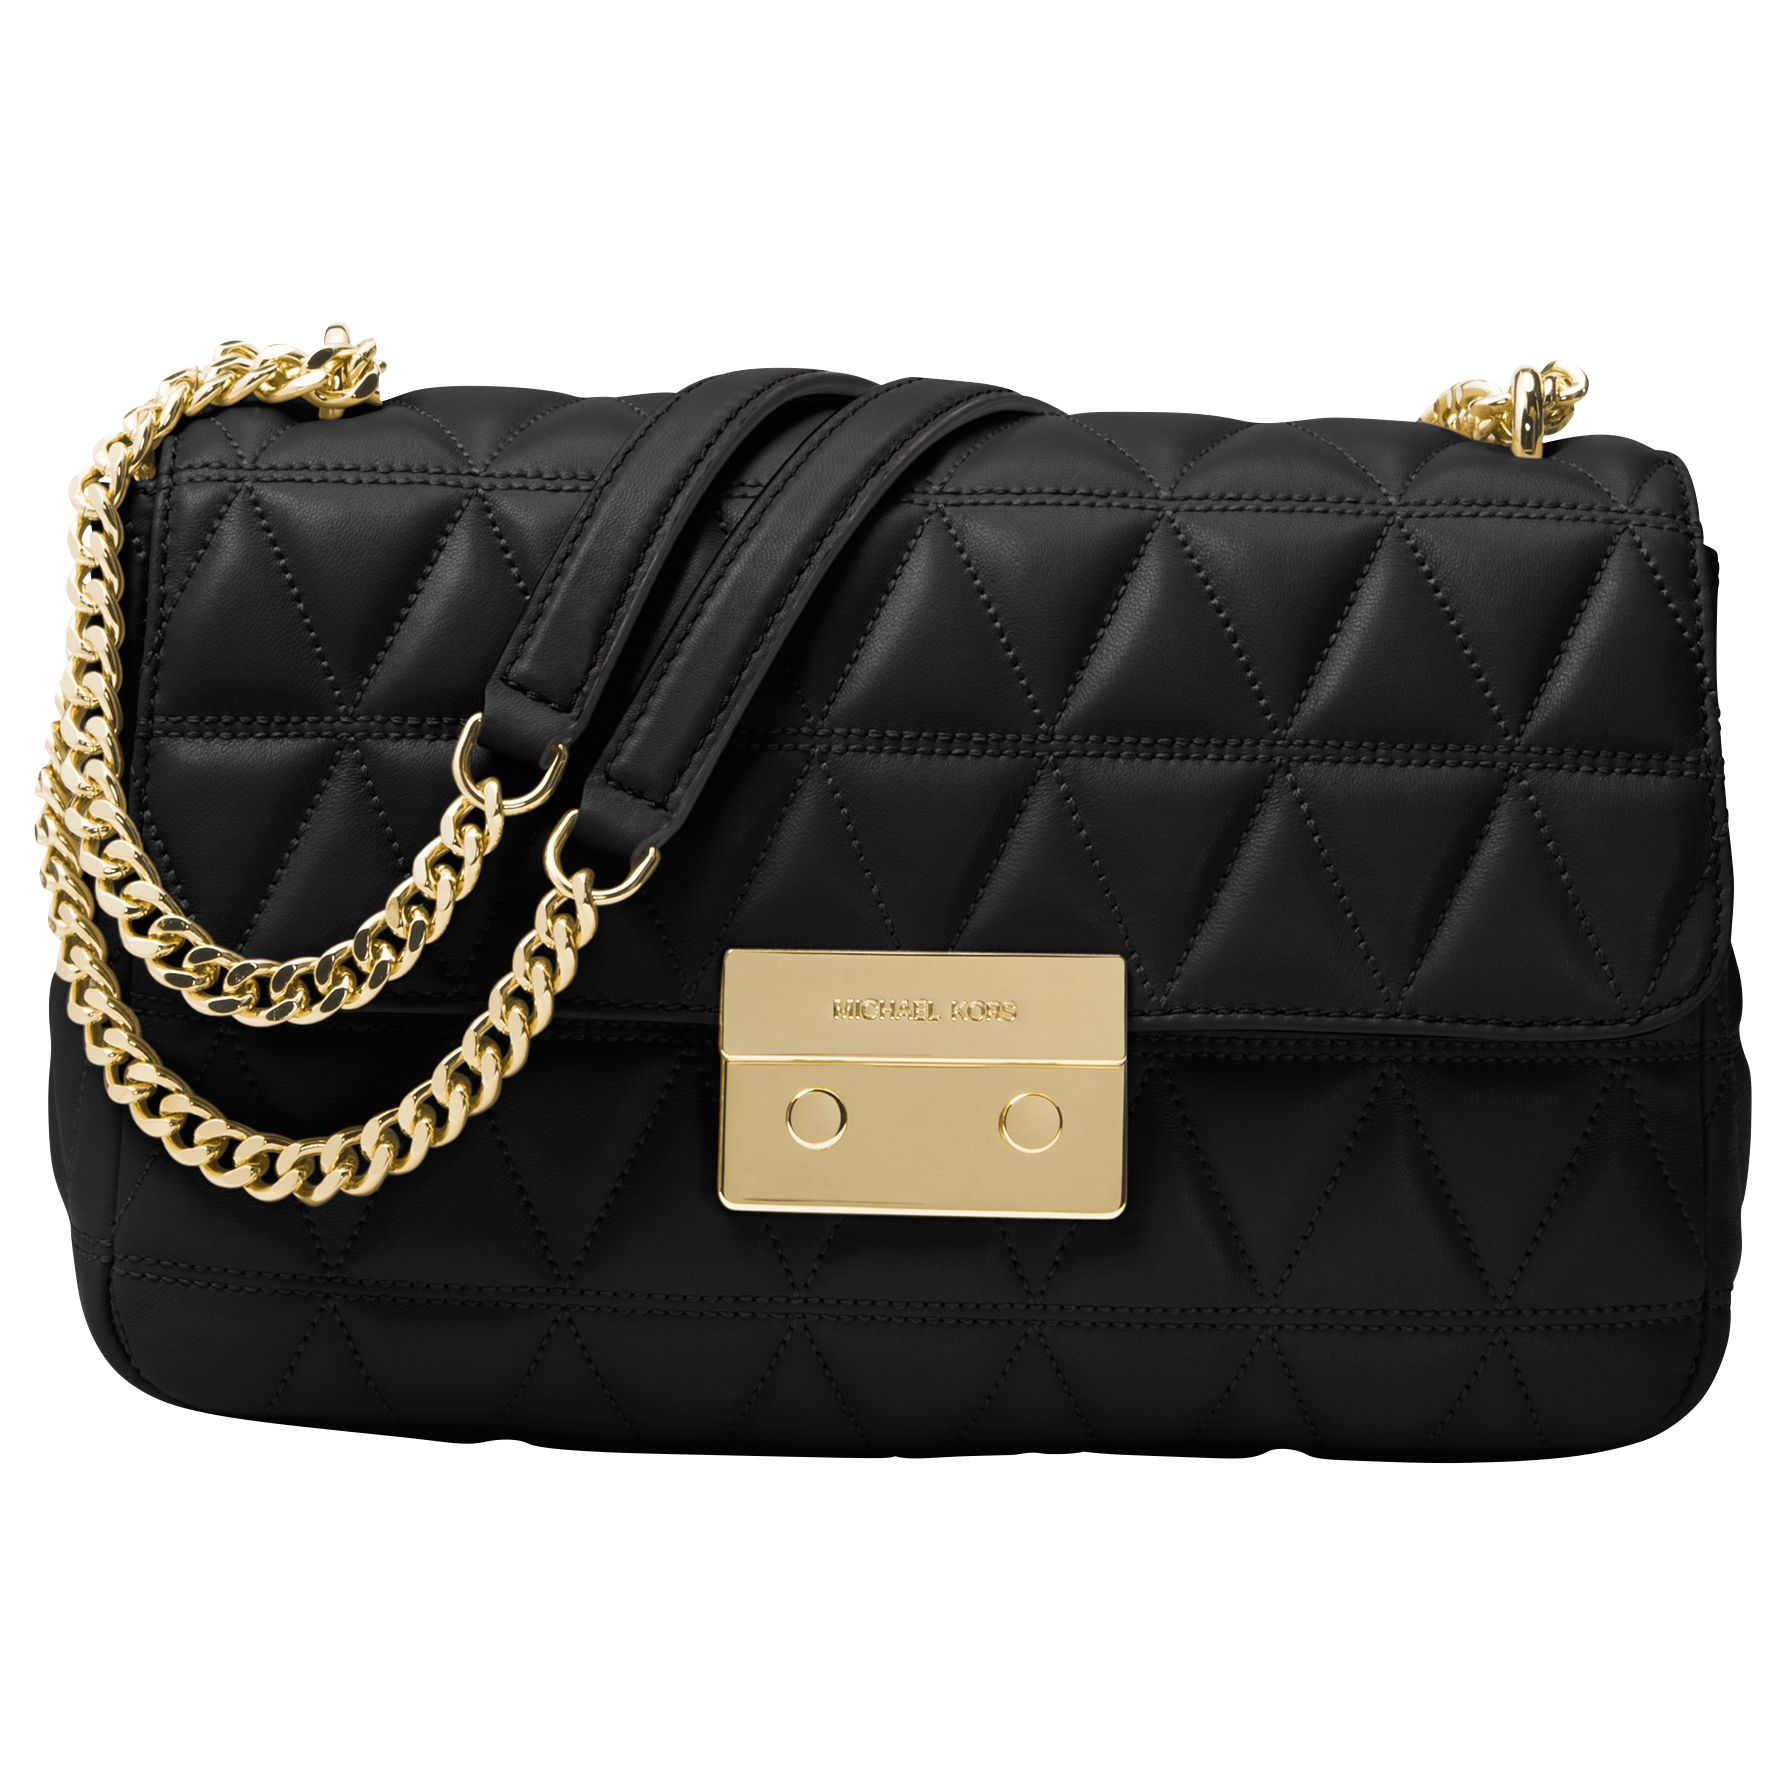 e4dcff17b74c MICHAEL Michael Kors Sloan Leather Long Chain Shoulder Bag